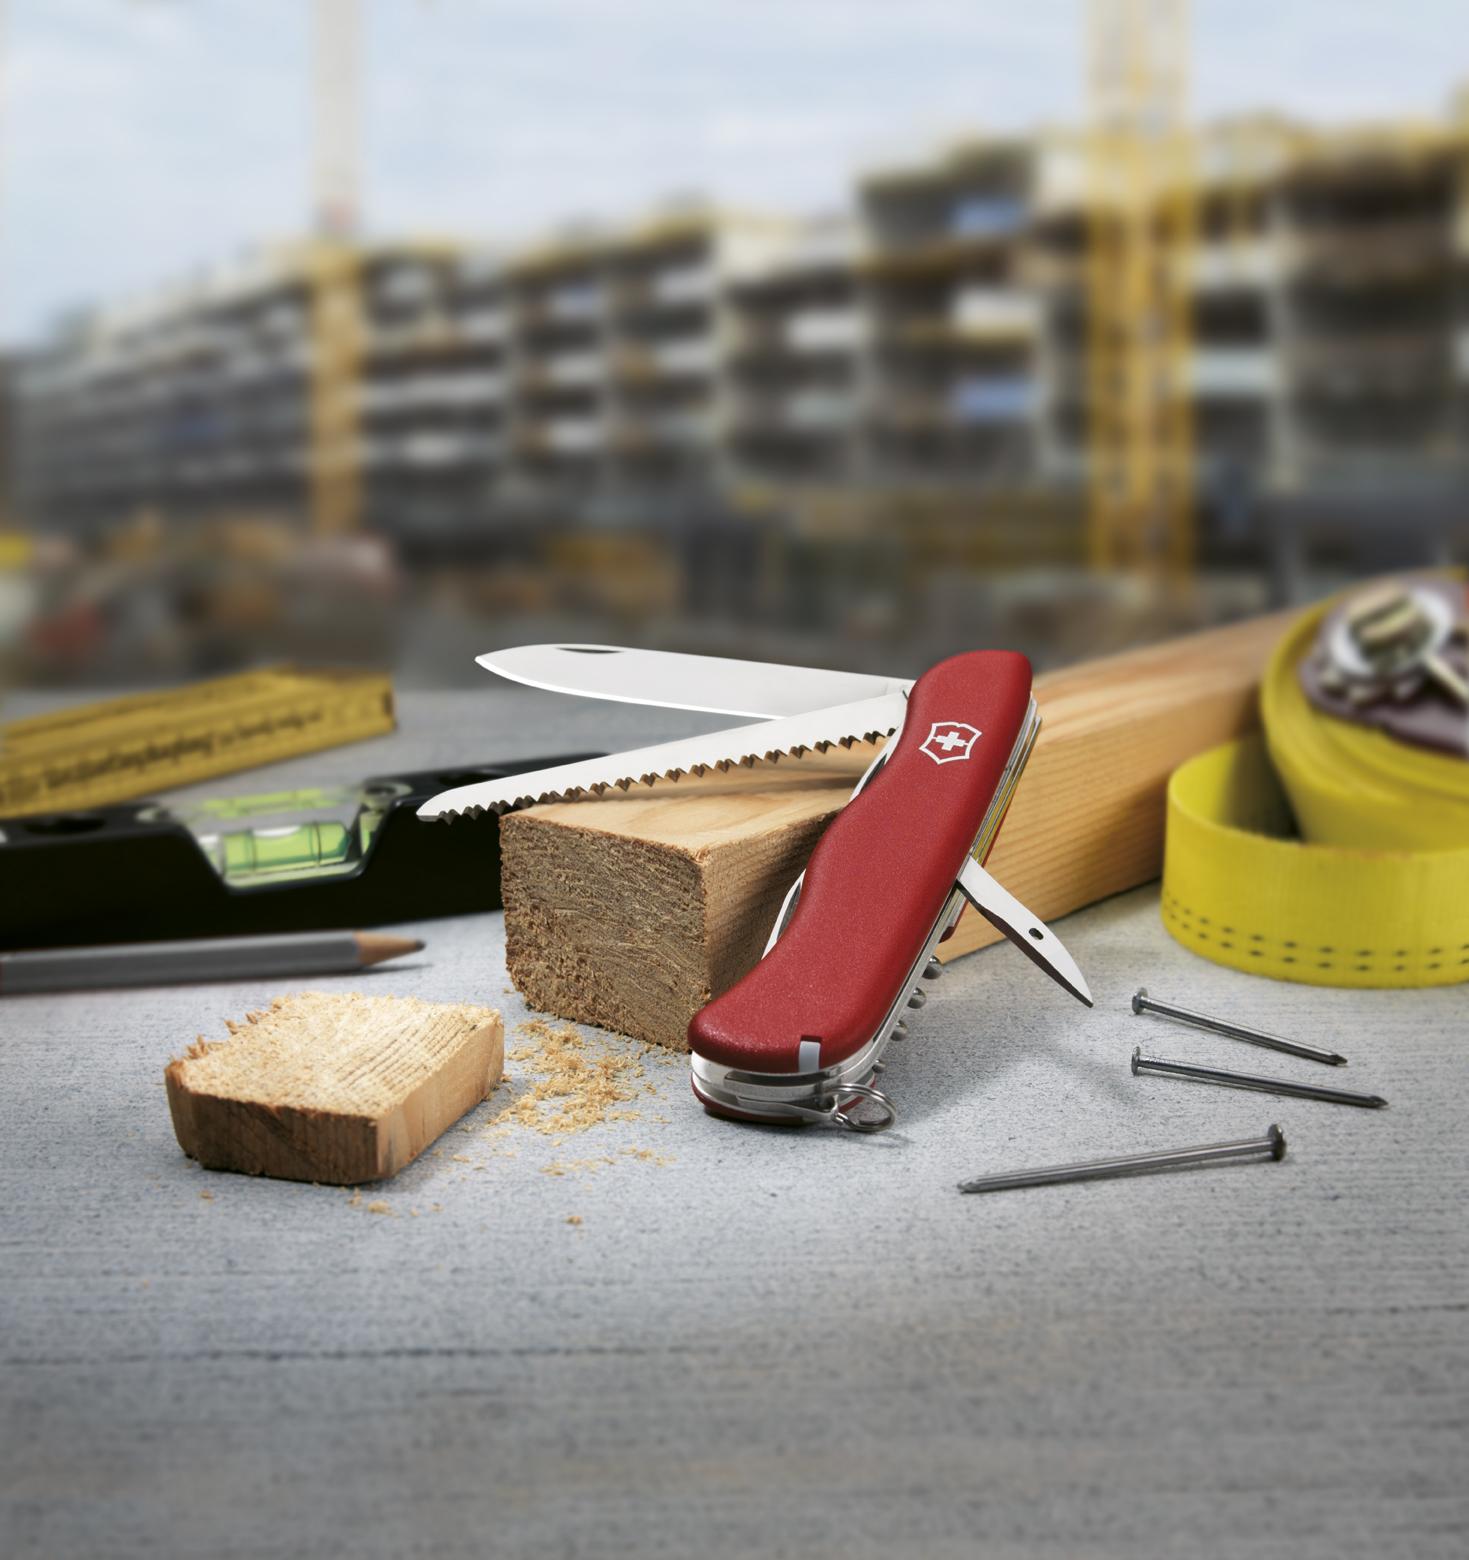 Швейцарский нож Victorinox Rucksack, 111 мм, 12 функ, красный   (0.8863)